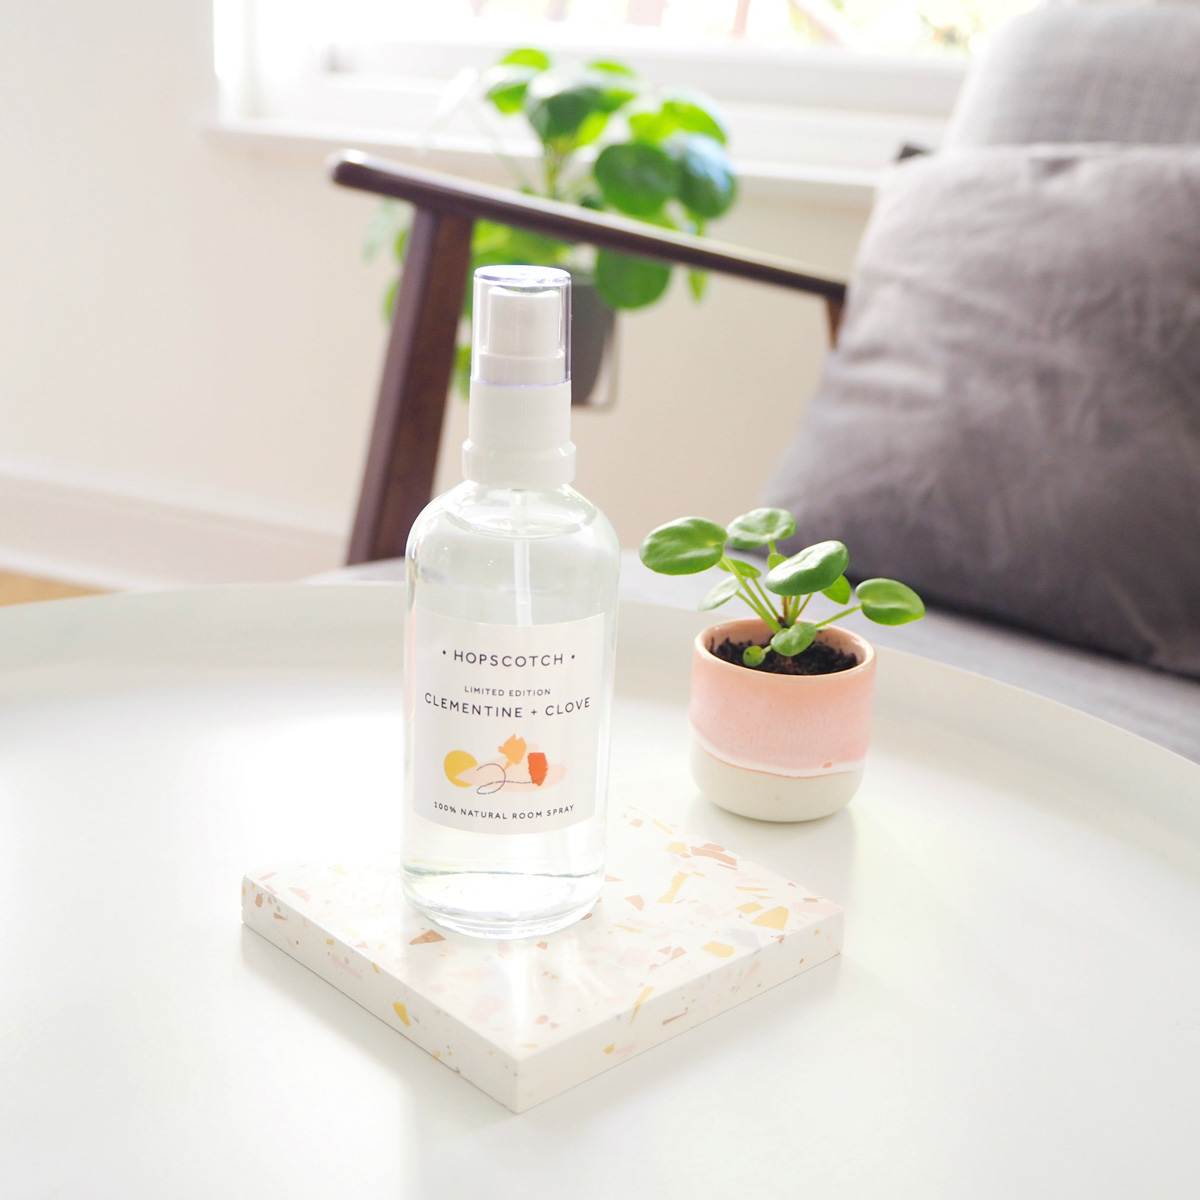 Clementine + Clove Room Spray